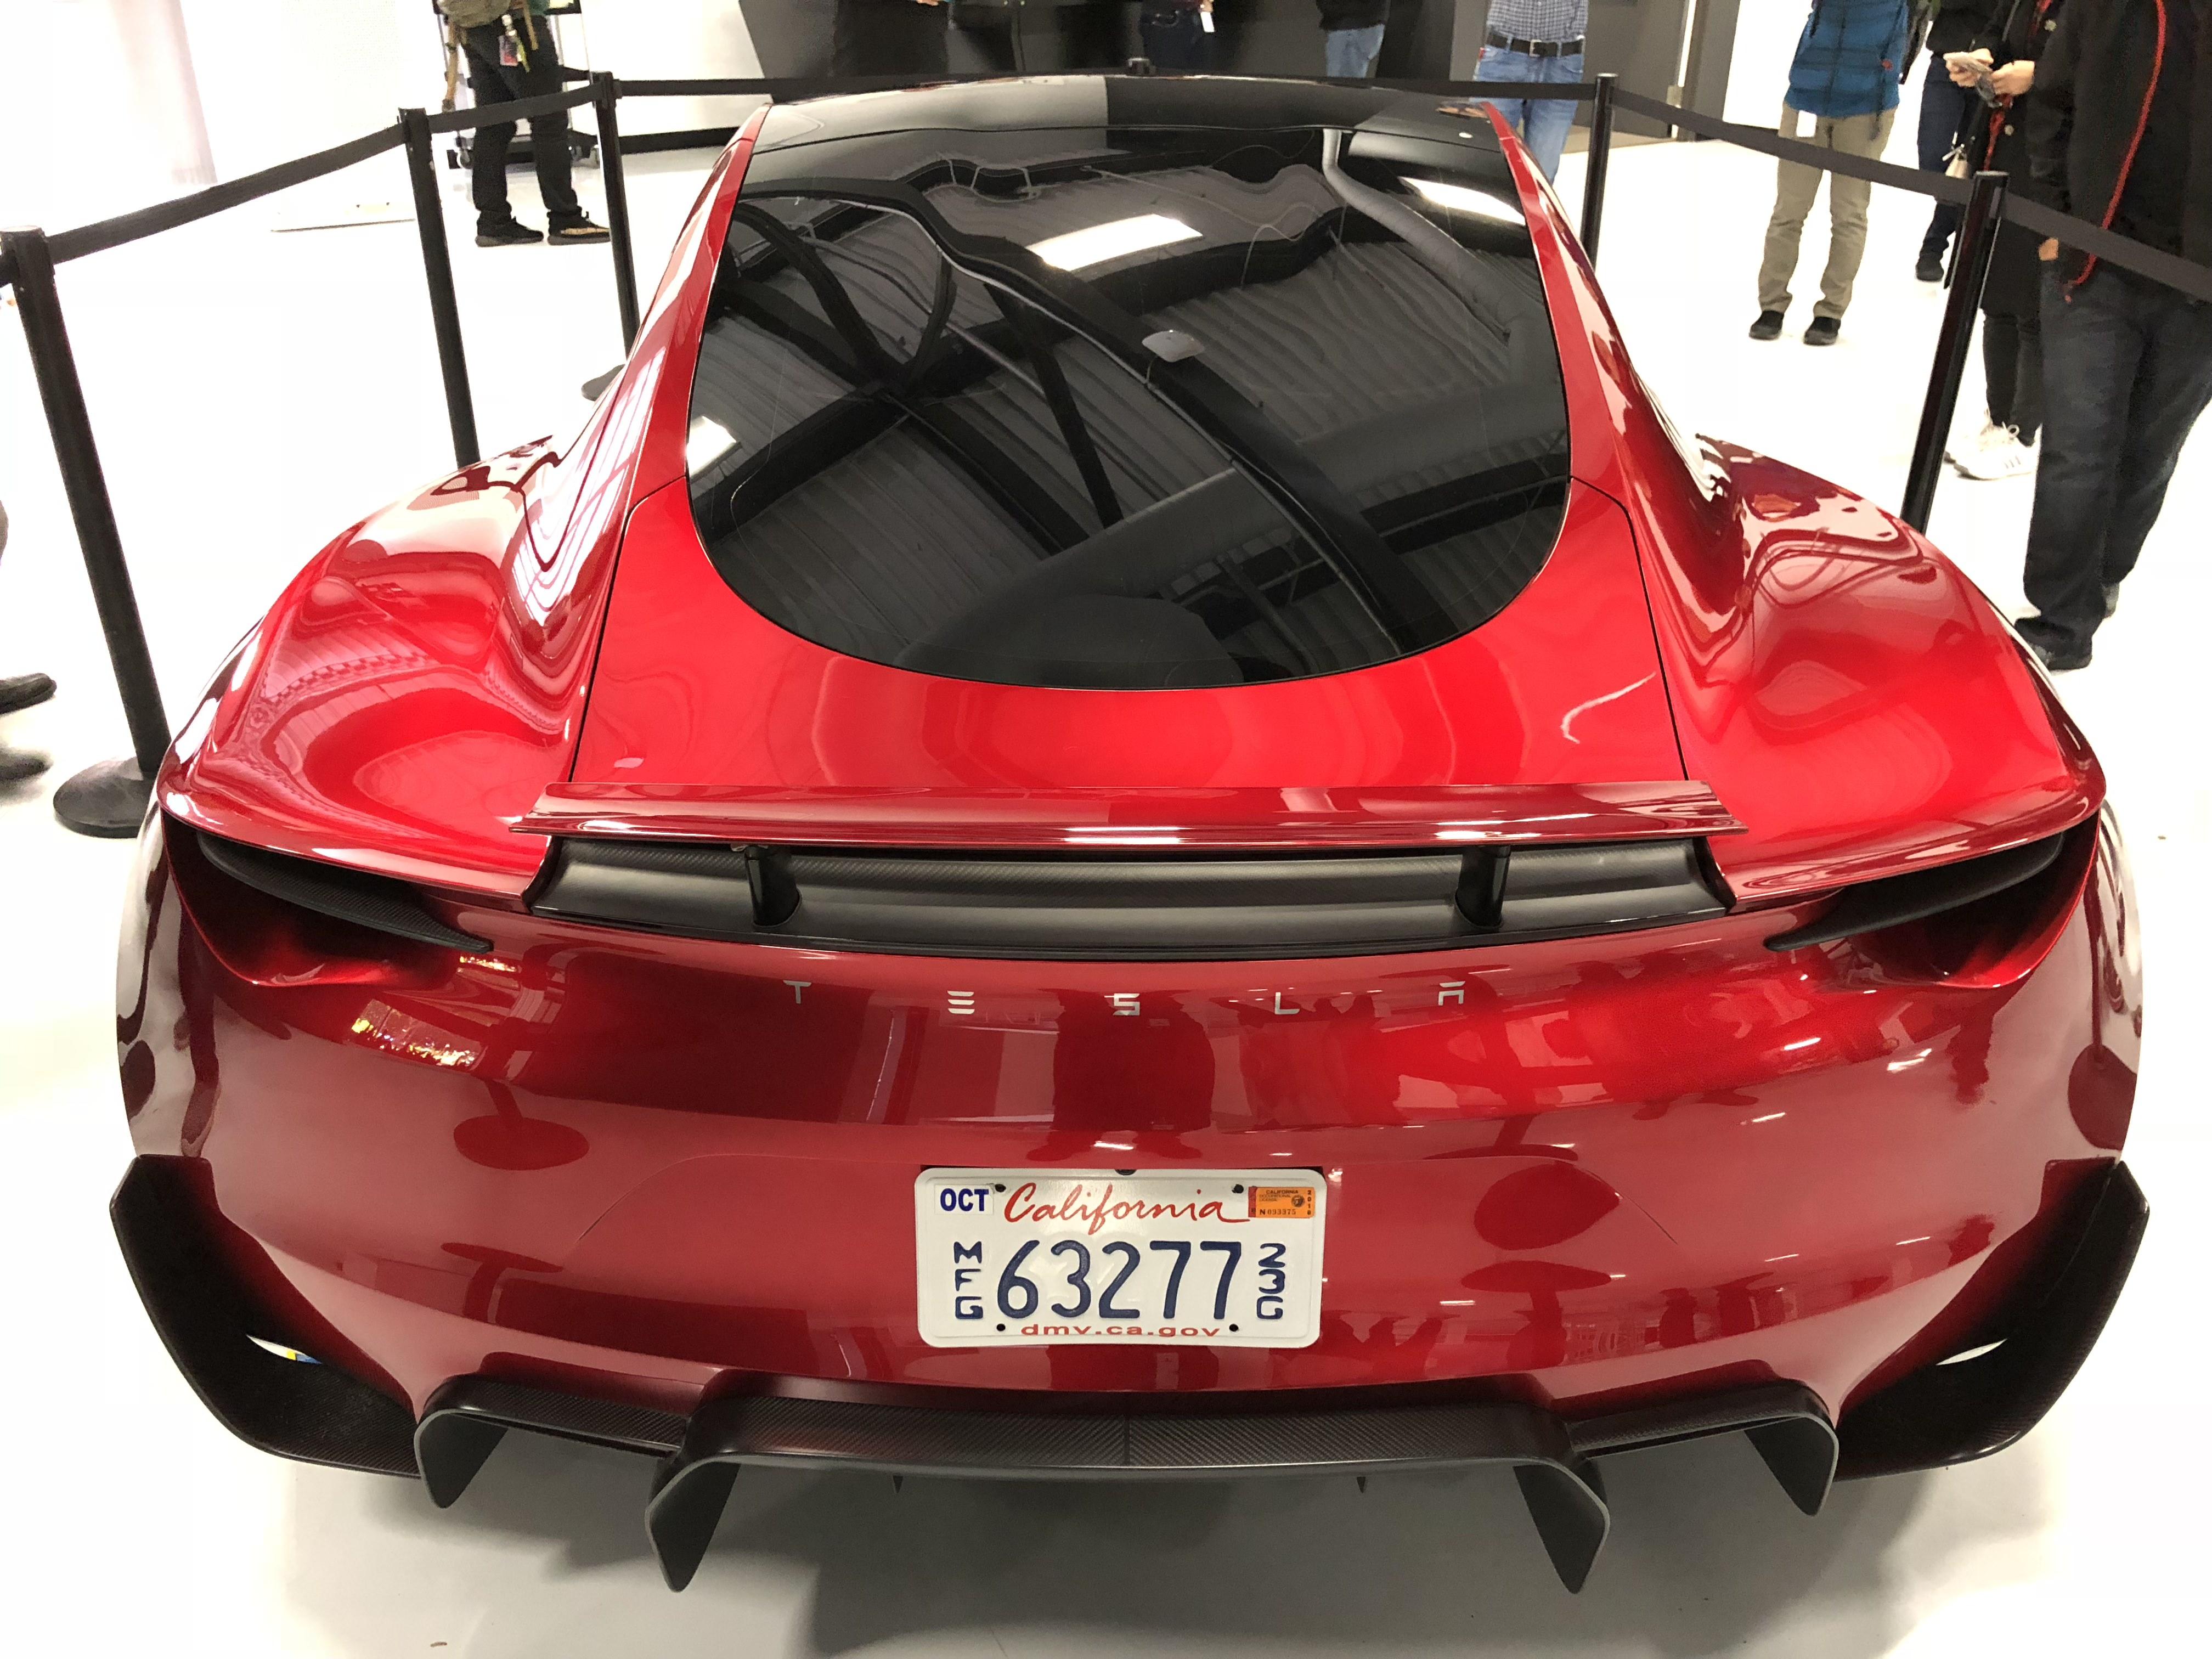 red-tesla-roadster-palo-alto-hq-10